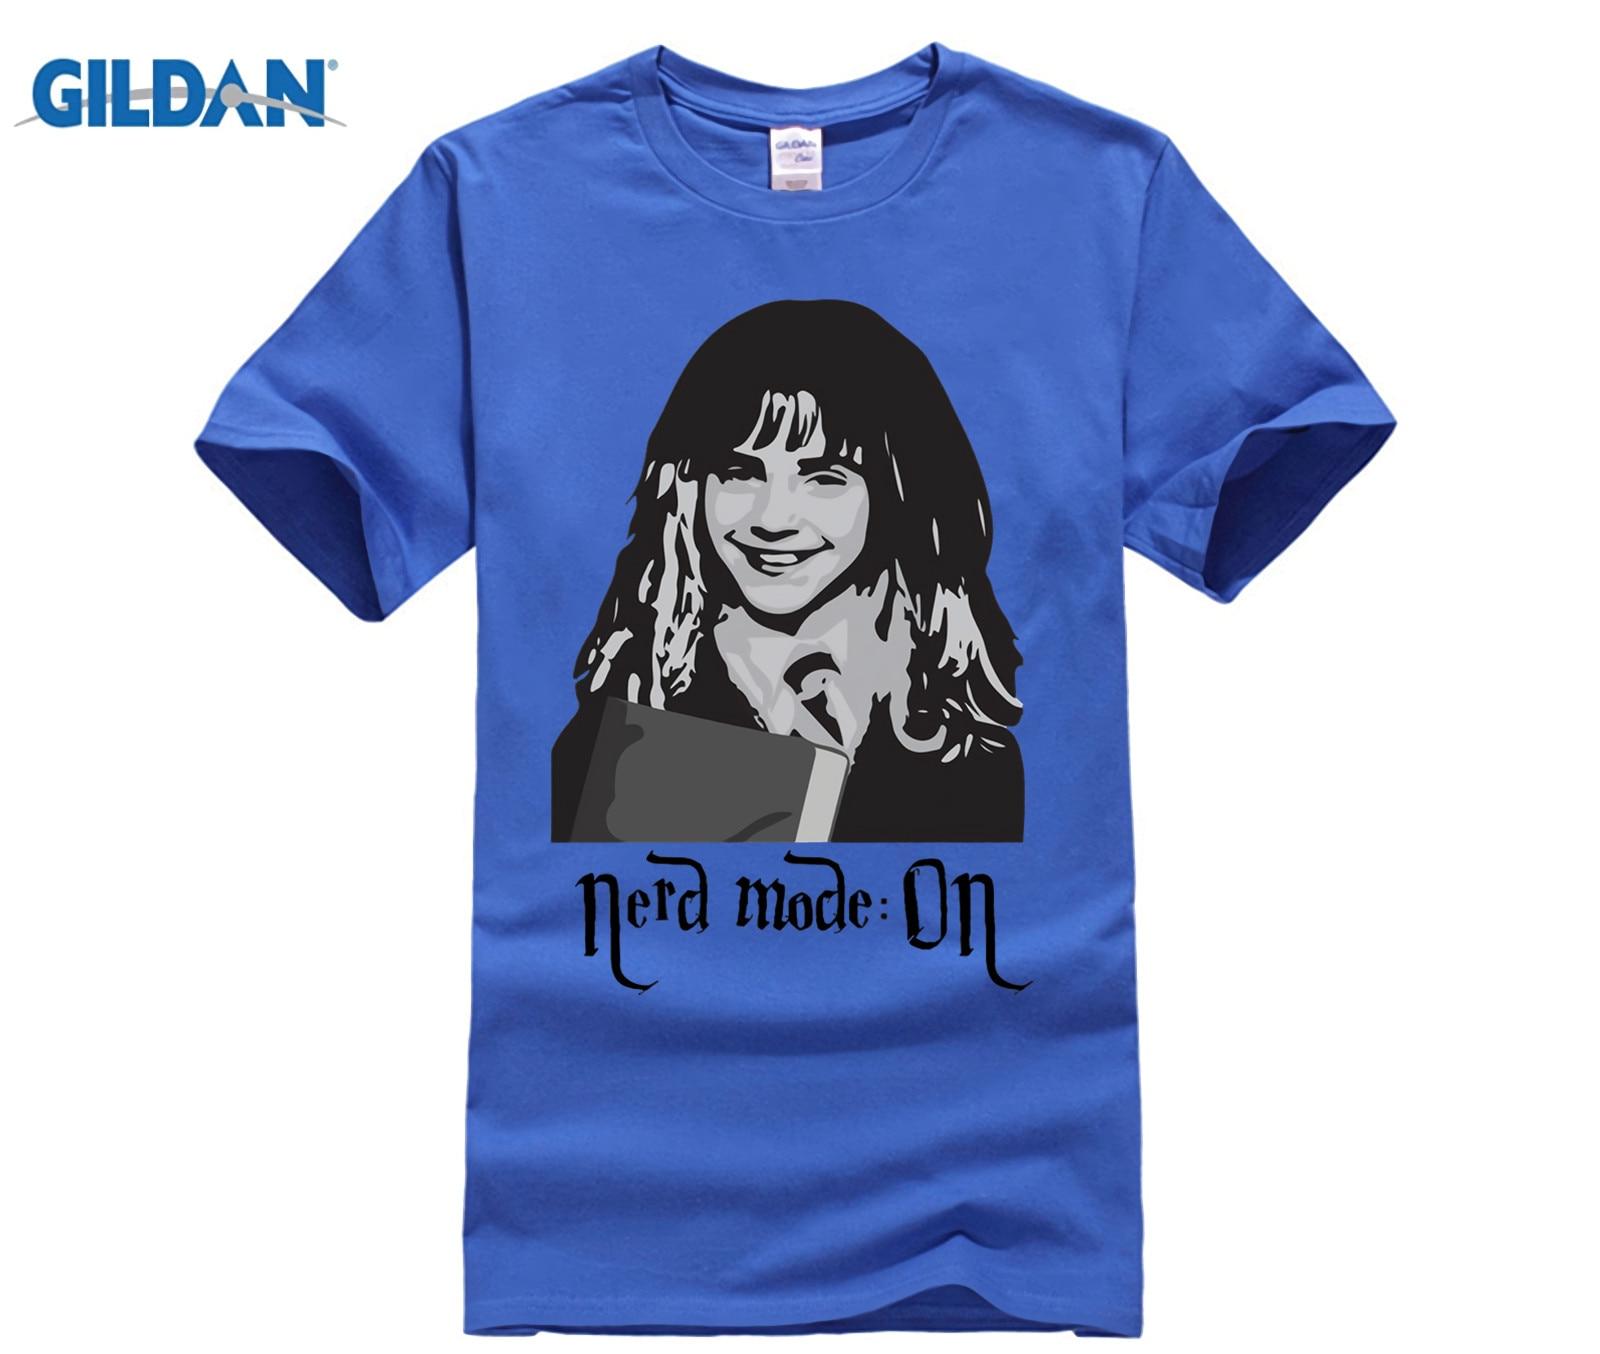 fc8269a68 GILDAN Harry Potter T Shirt Funny Movie Shirts Graphic Tee Shirt Hermione  Granger Tee Nerd T shirt Harry Potter Clothing Gift-in T-Shirts from Men's  ...